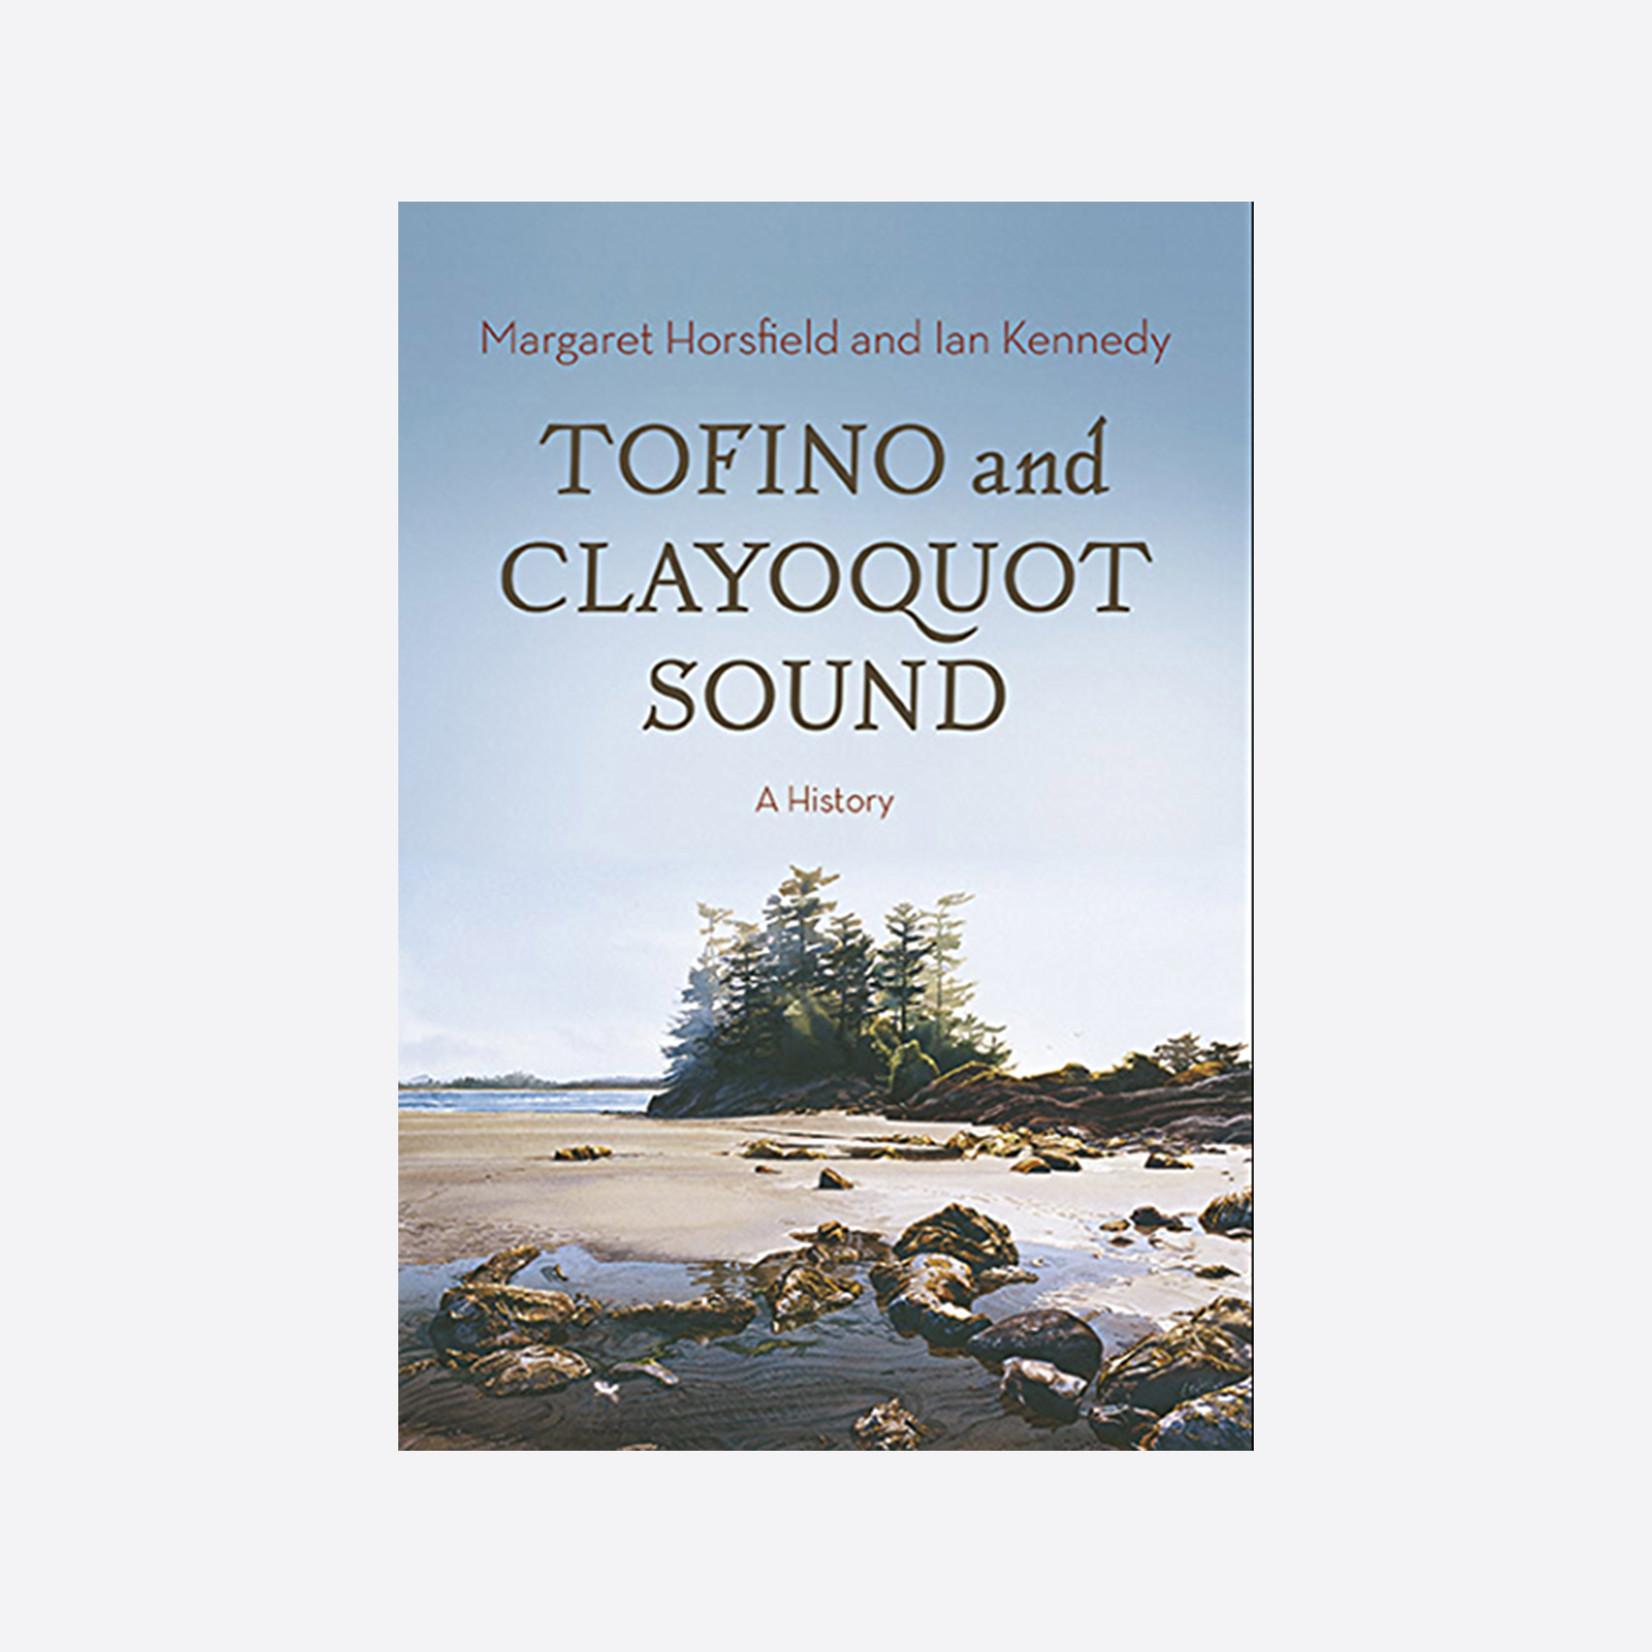 Tofino & Clayoquot Sound